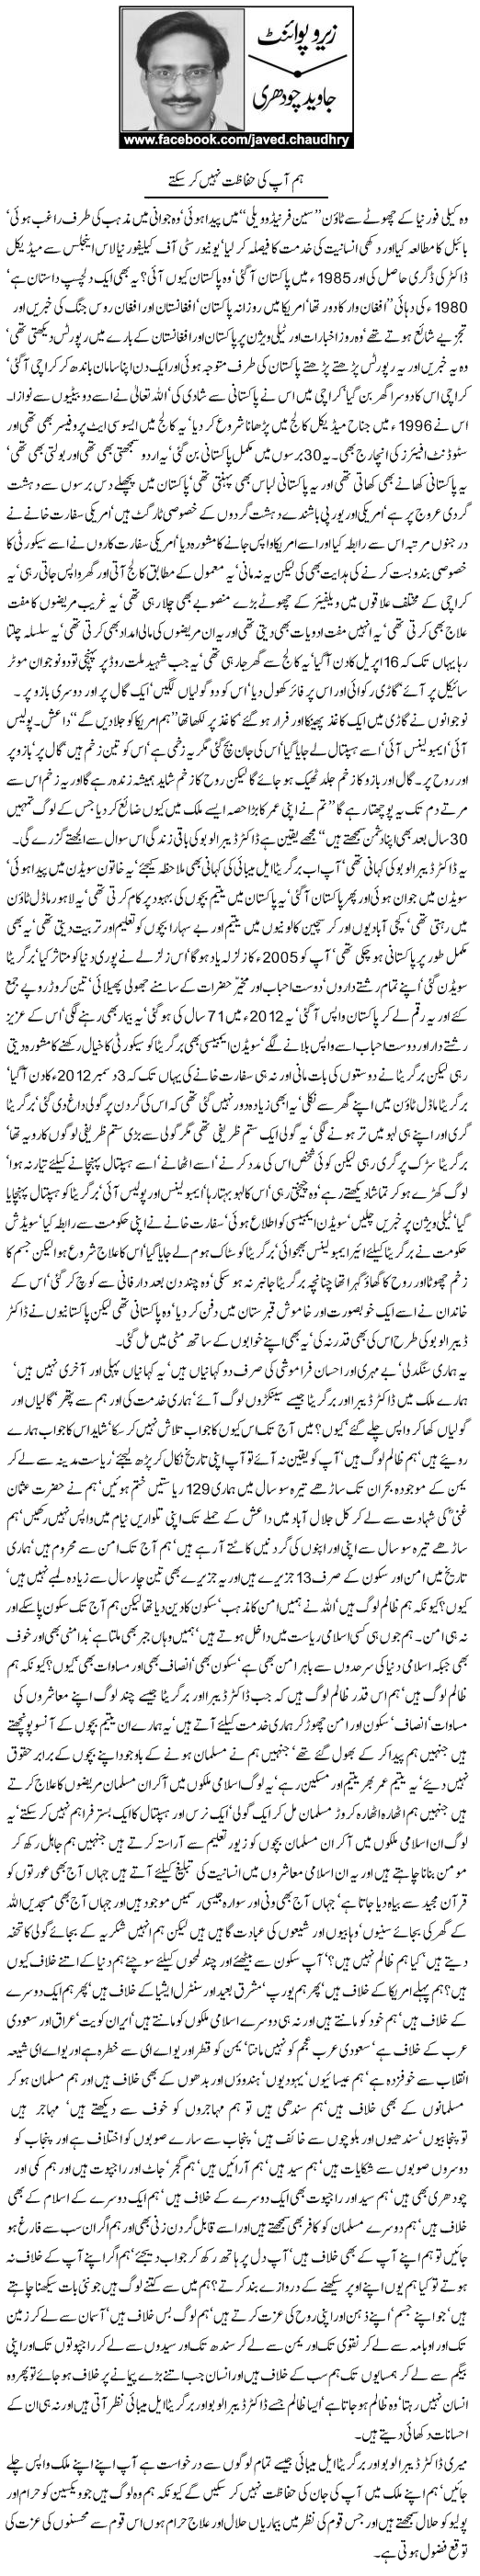 Hum Aapki Hifazat Nahi Kr Sakte By Javed Chaudhry Zero Poin - Pakfunny